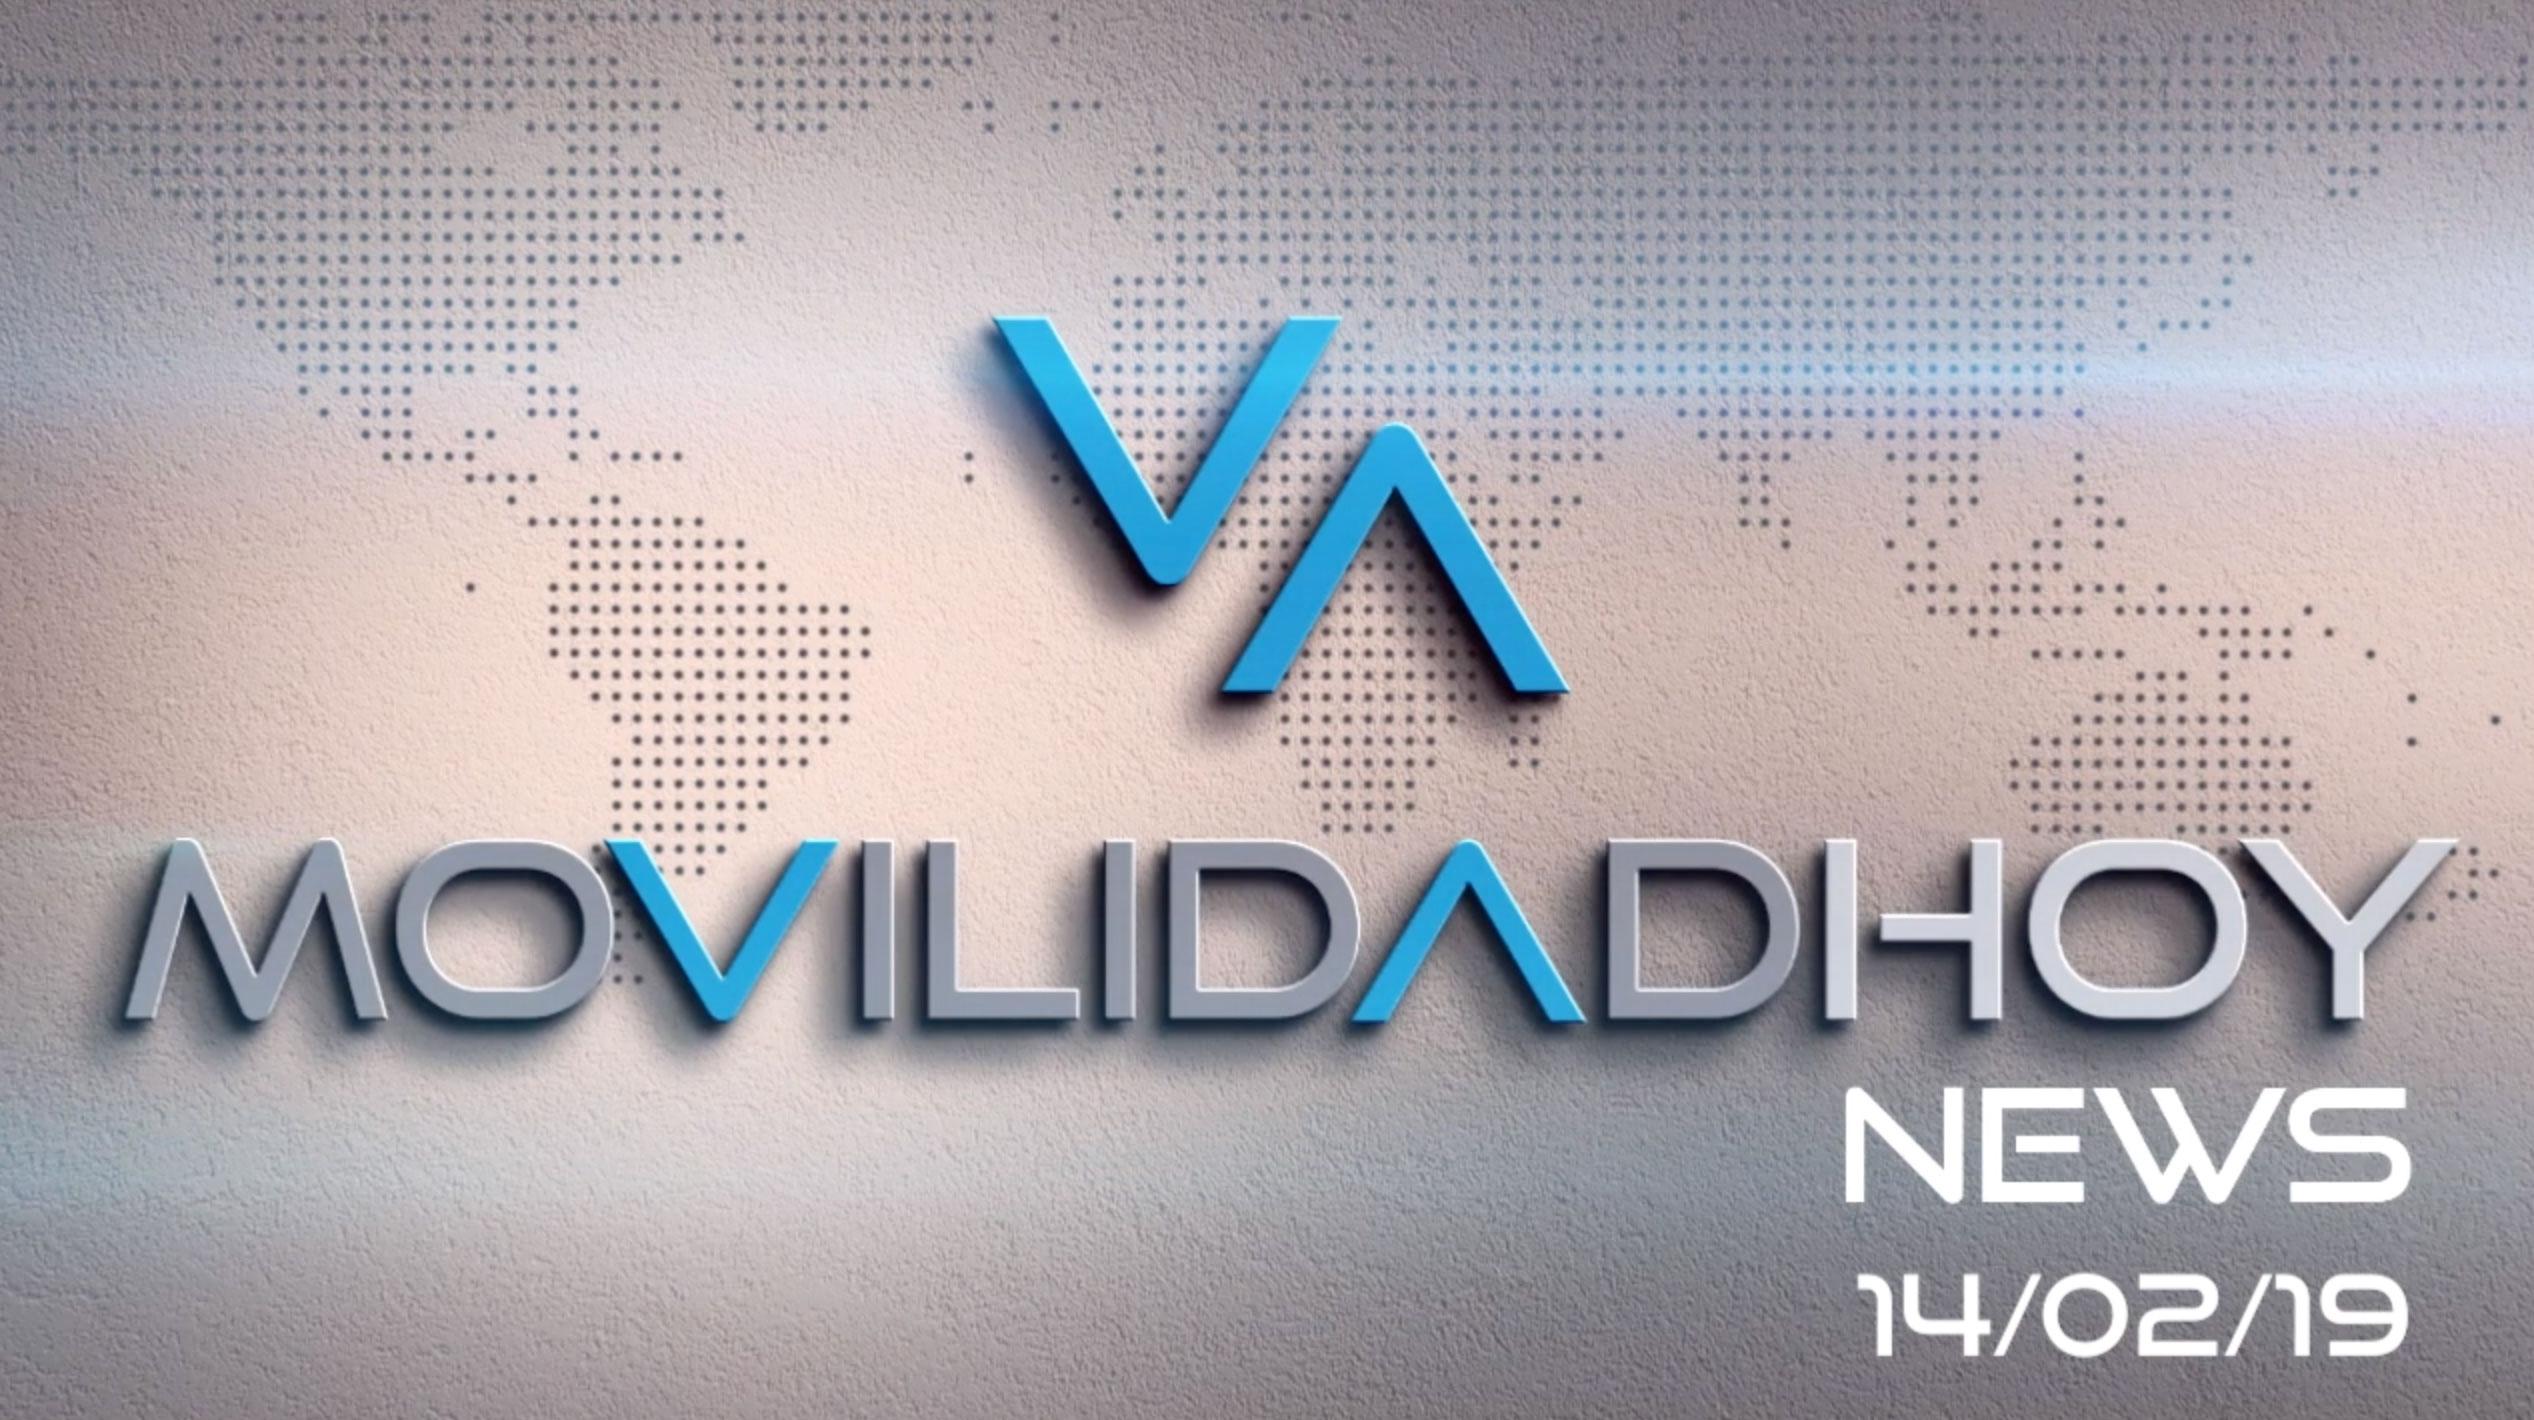 MovilidadHoy News